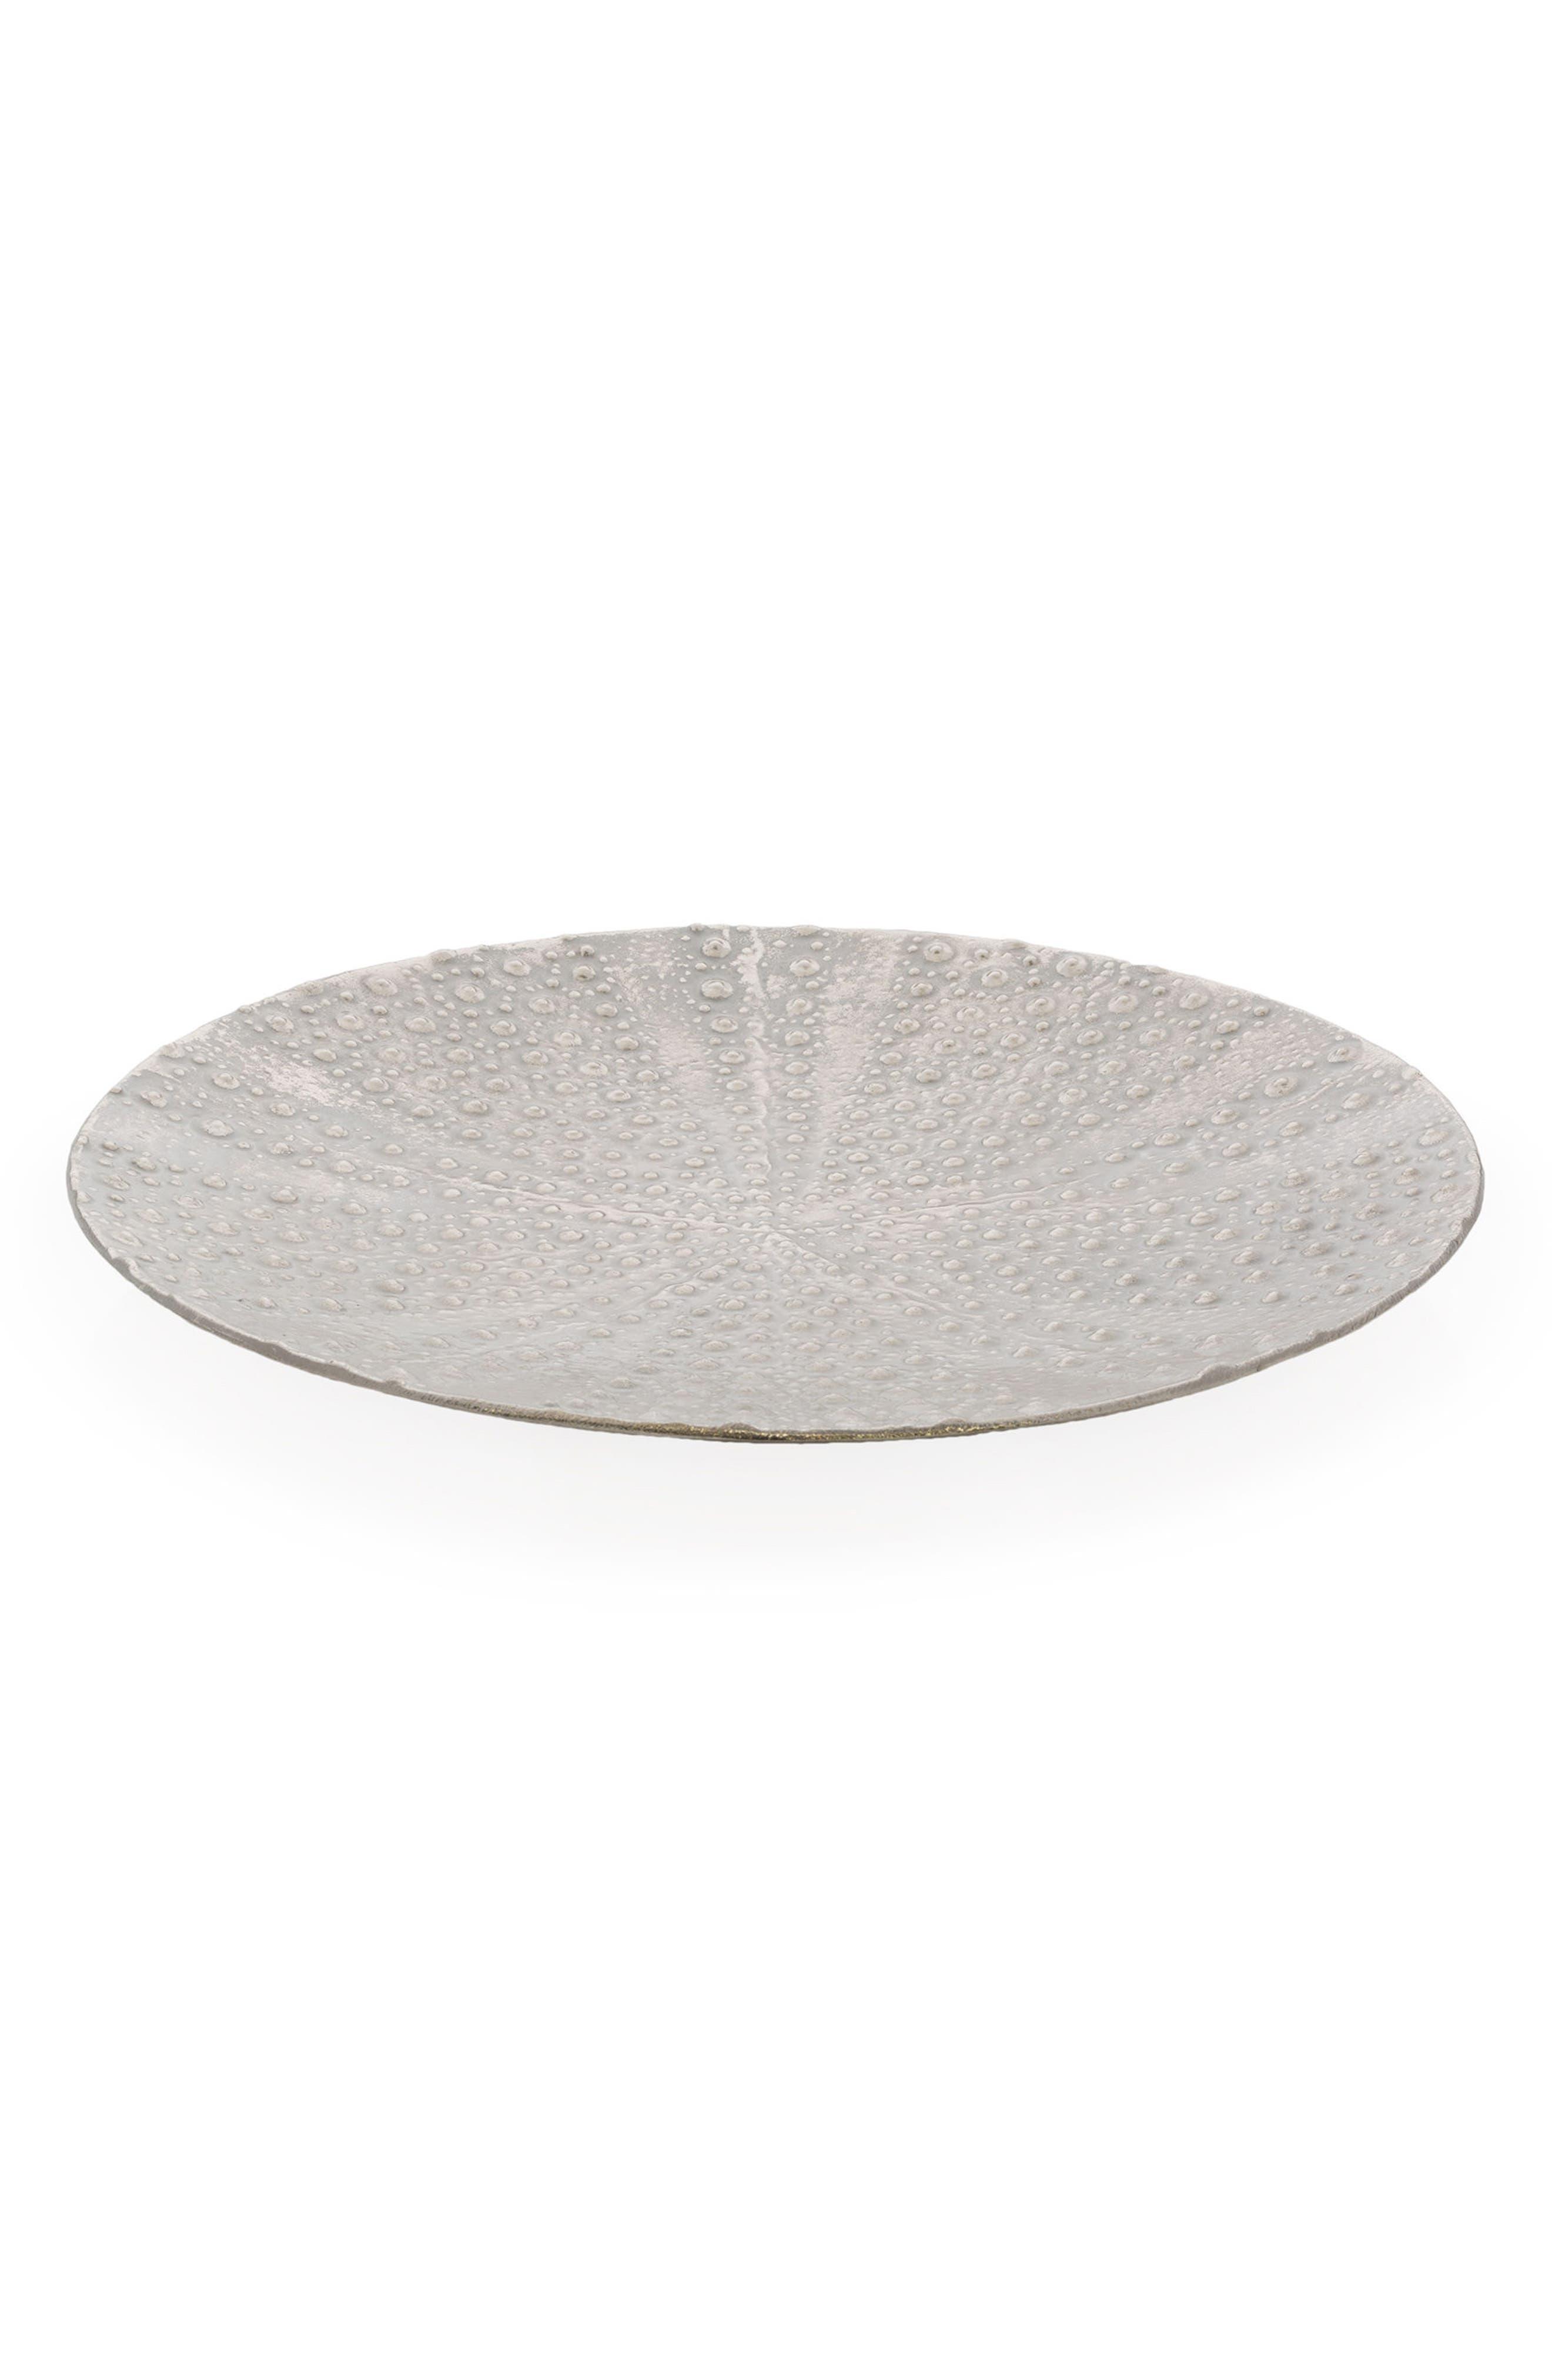 Ocean Reef Sea Urchin Platter,                             Main thumbnail 1, color,                             Silver